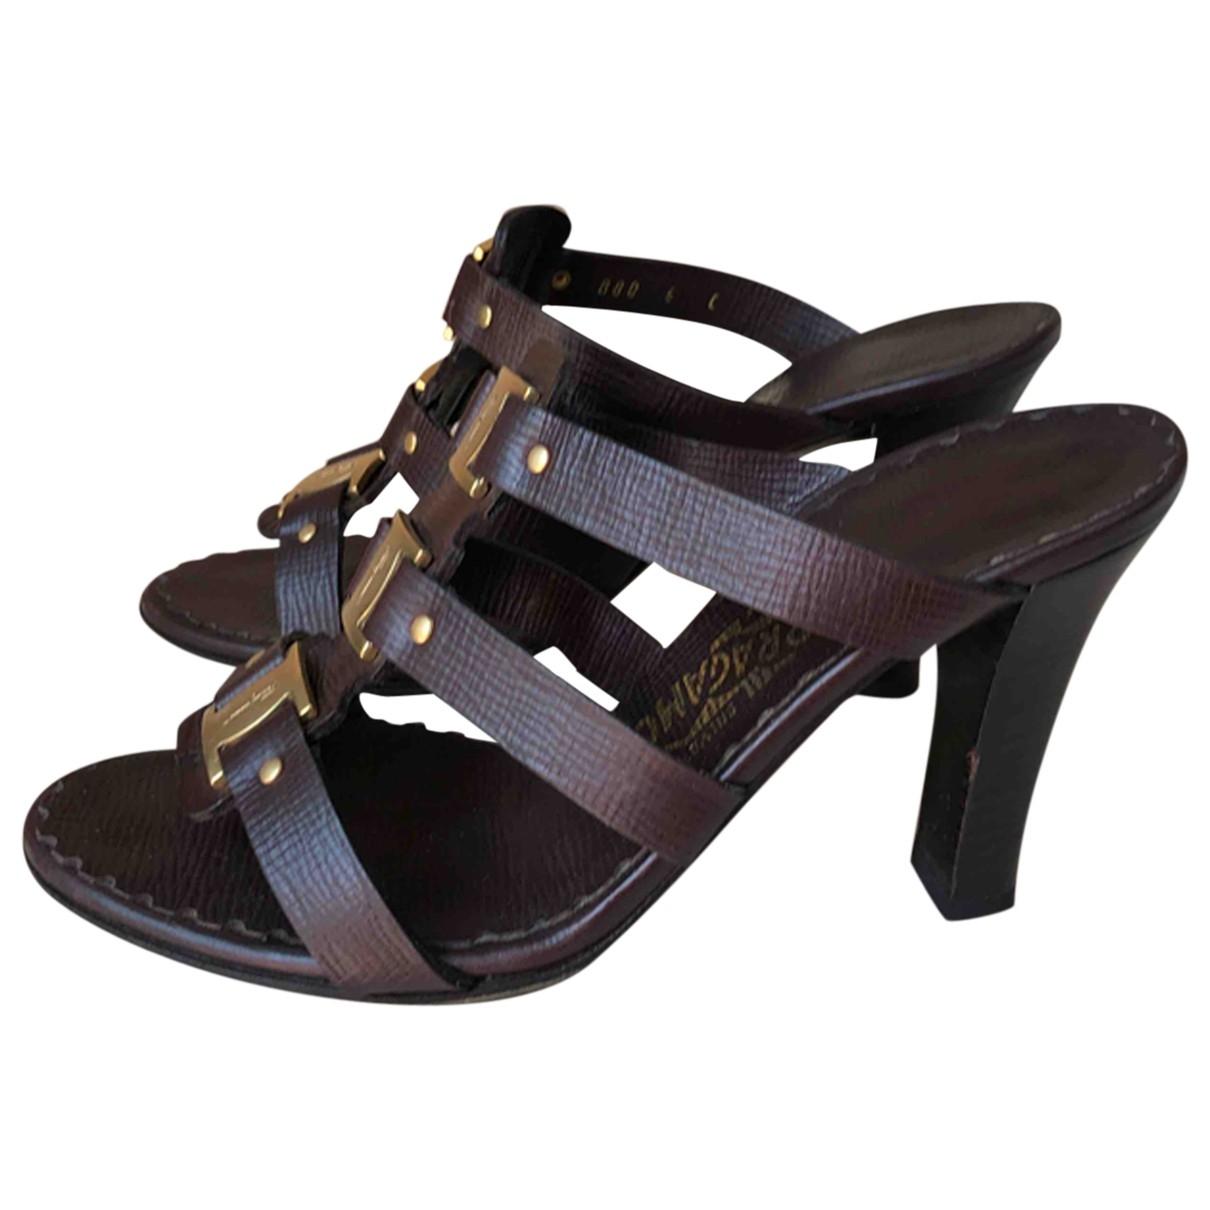 Salvatore Ferragamo \N Brown Leather Sandals for Women 36 EU